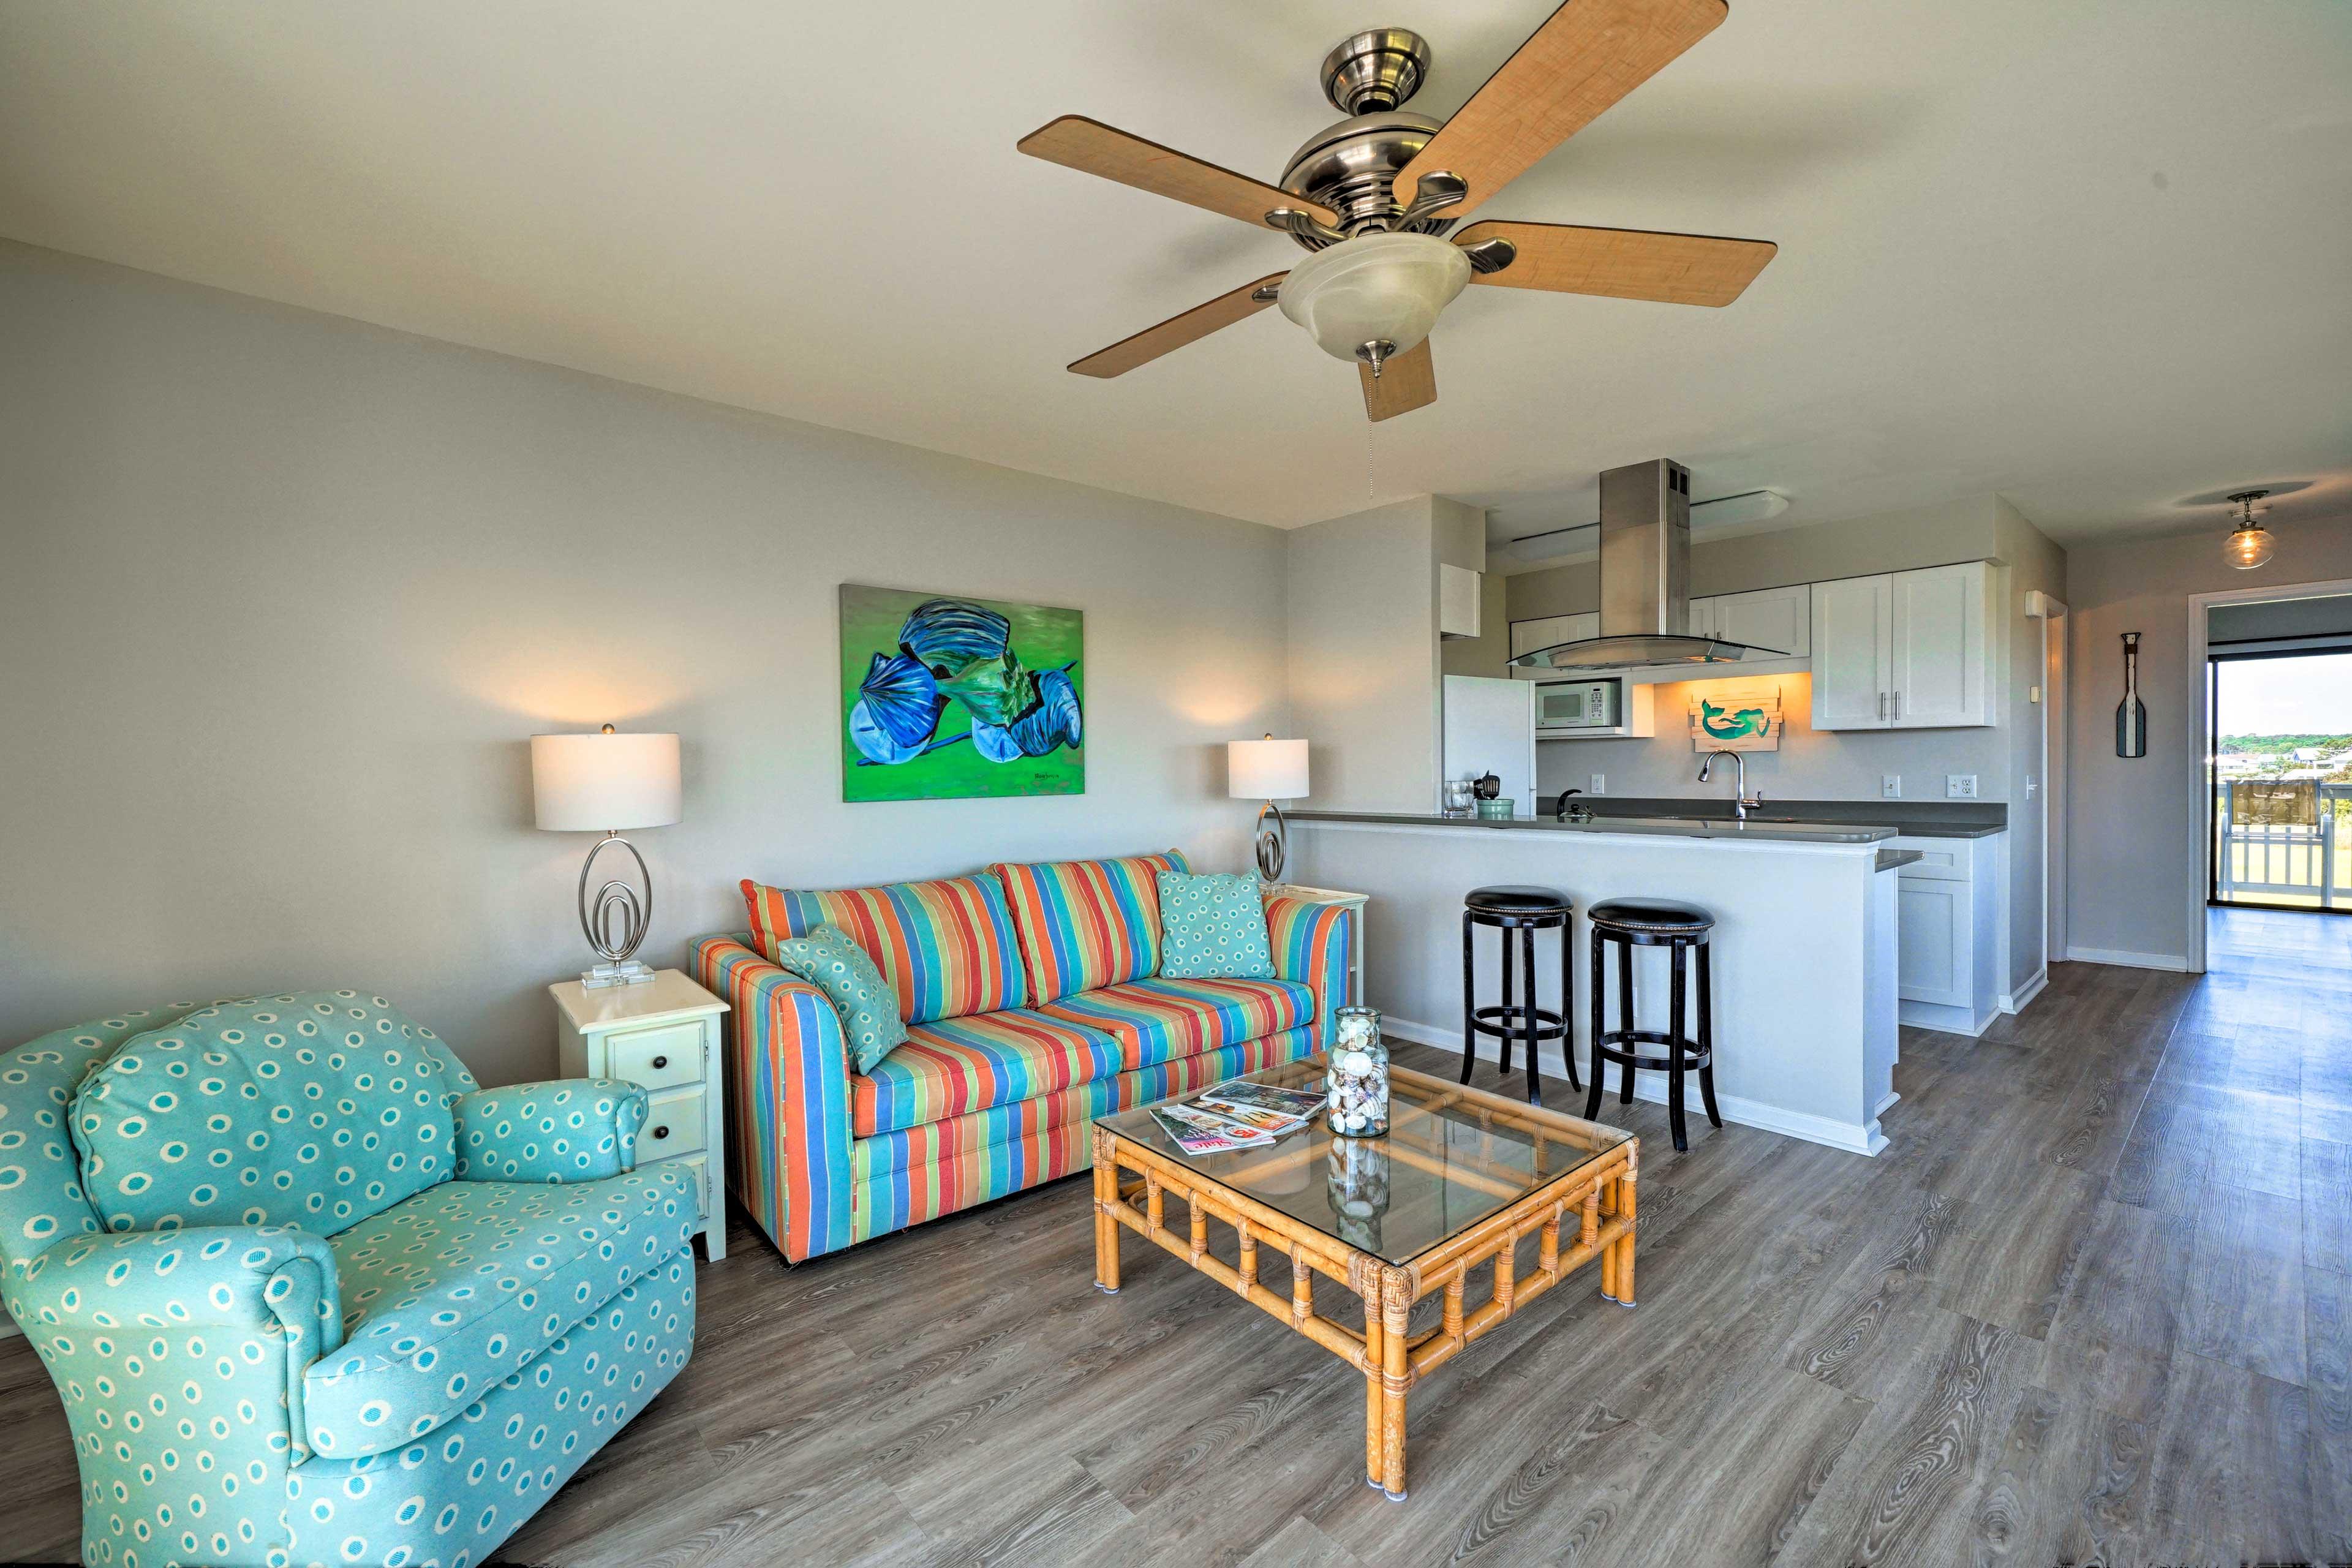 Enjoy a comfortable stay in Carolina Beach at this 1-bedroom, 1-bath condo!